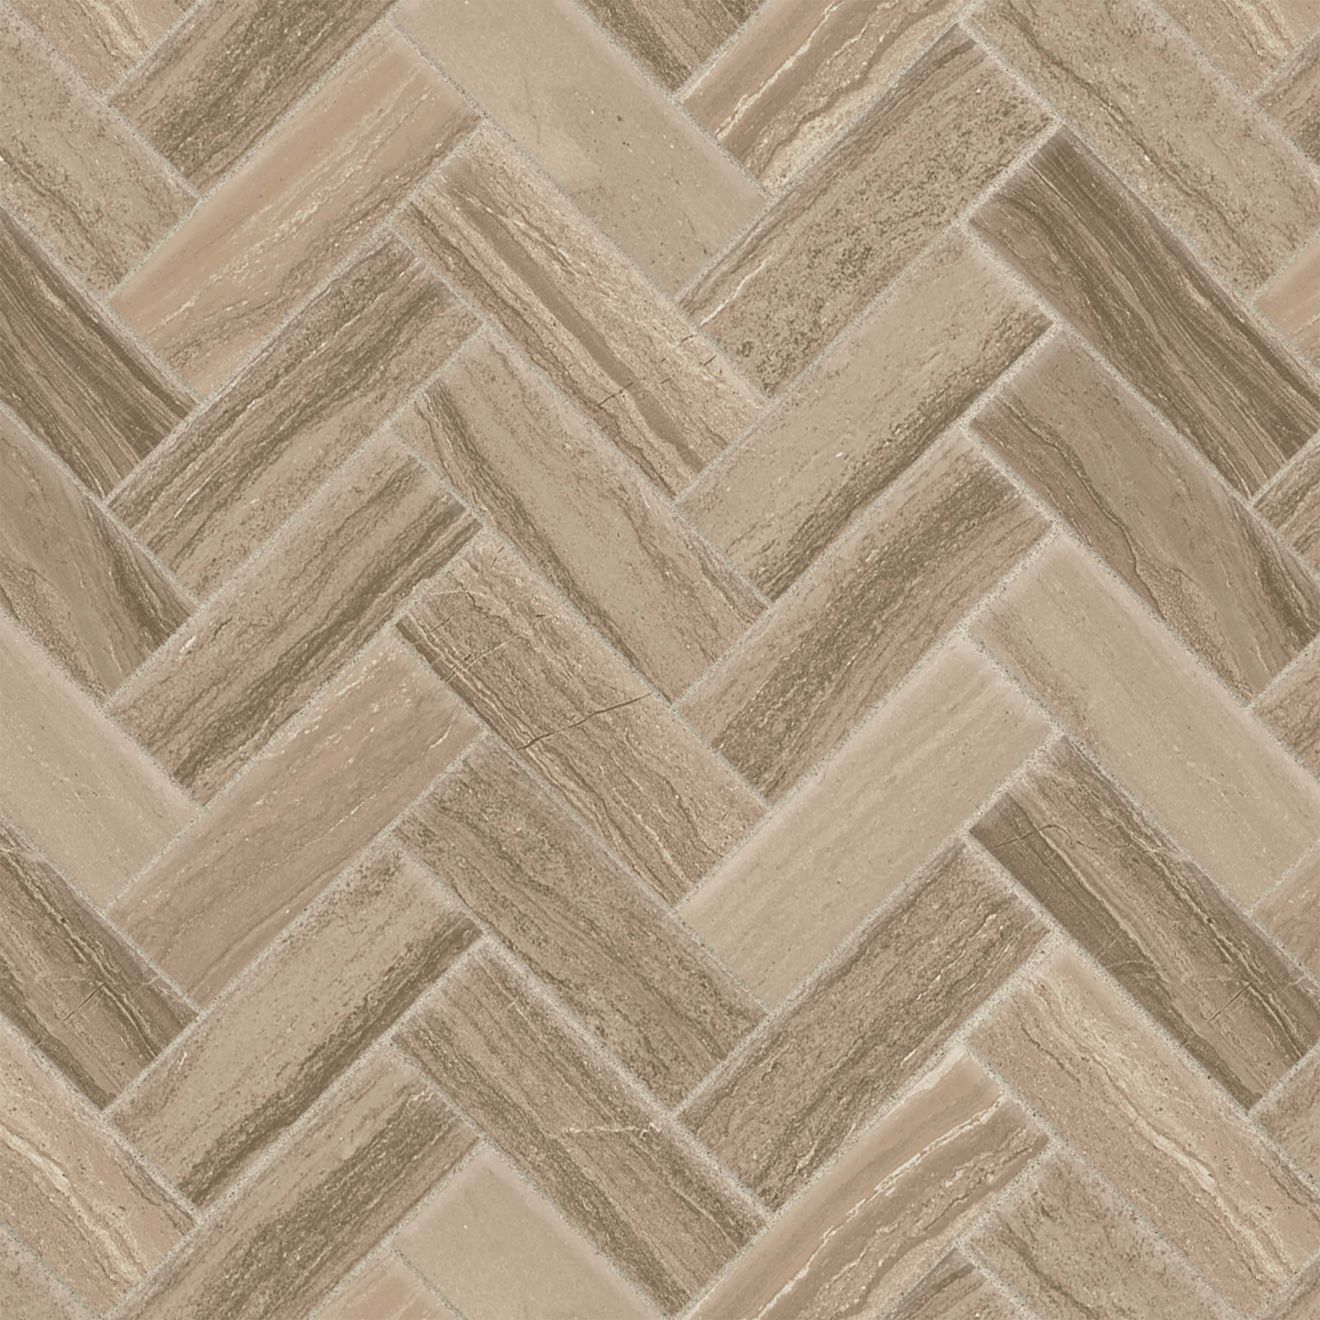 "Highland 1"" x 4"" Floor & Wall Mosaic in Beige"